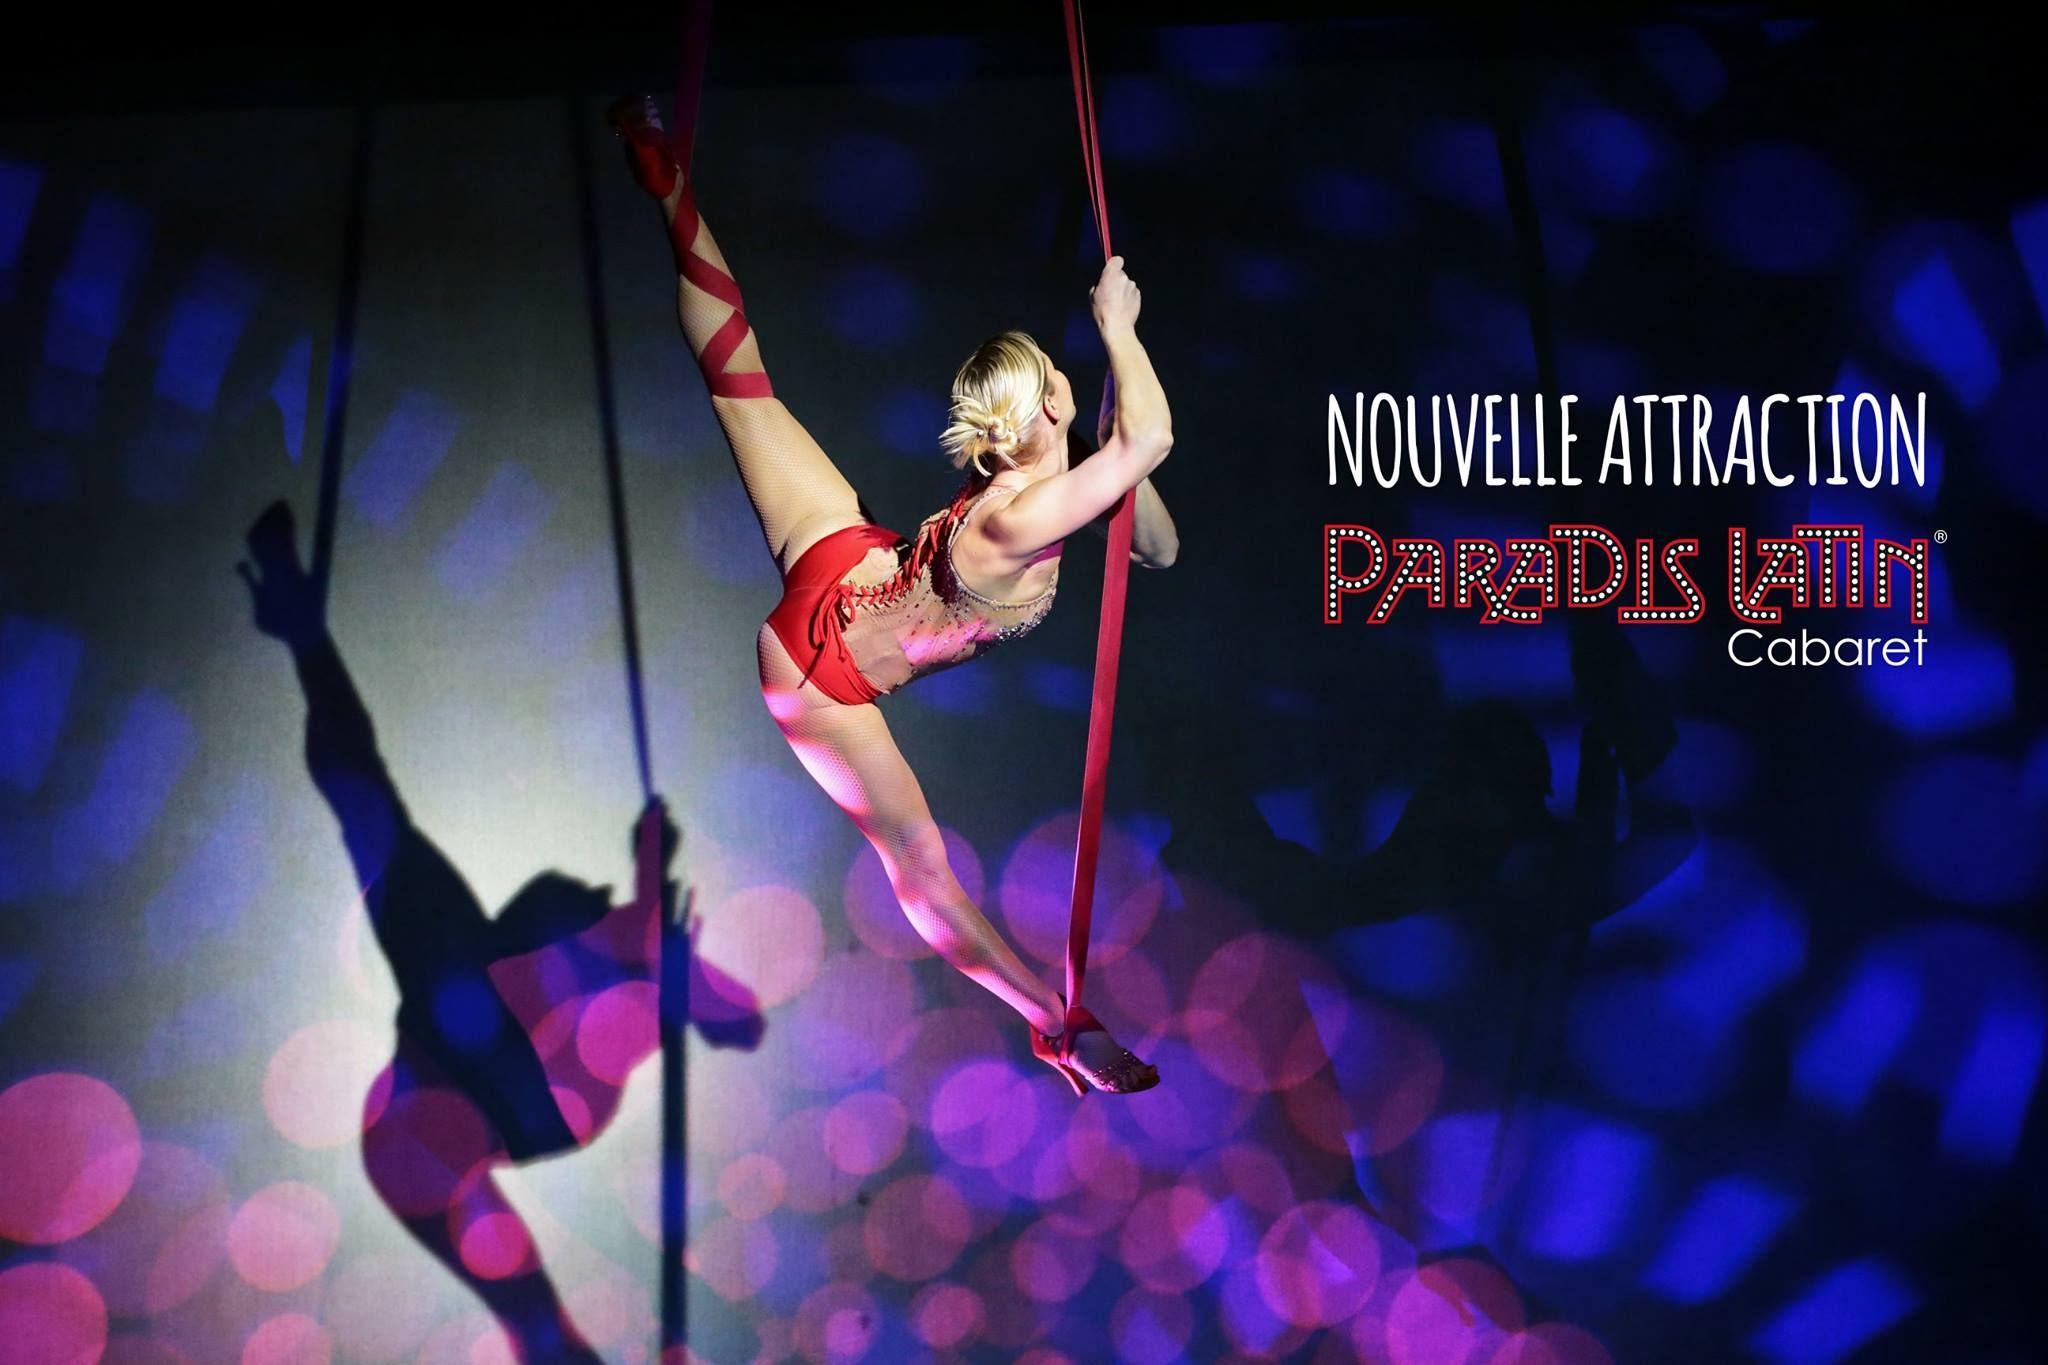 News: We present Natalia Bouglione, the new aerial attraction Paradis Latin! You like? Likez! #ParadisLatin #Paris   http://www.paradislatin.com/ Encore plus de photos sur notre page facebook : https://www.facebook.com/ParadisLatin https://twitter.com/Paradis_Latin https://instagram.com/paradis_latin/